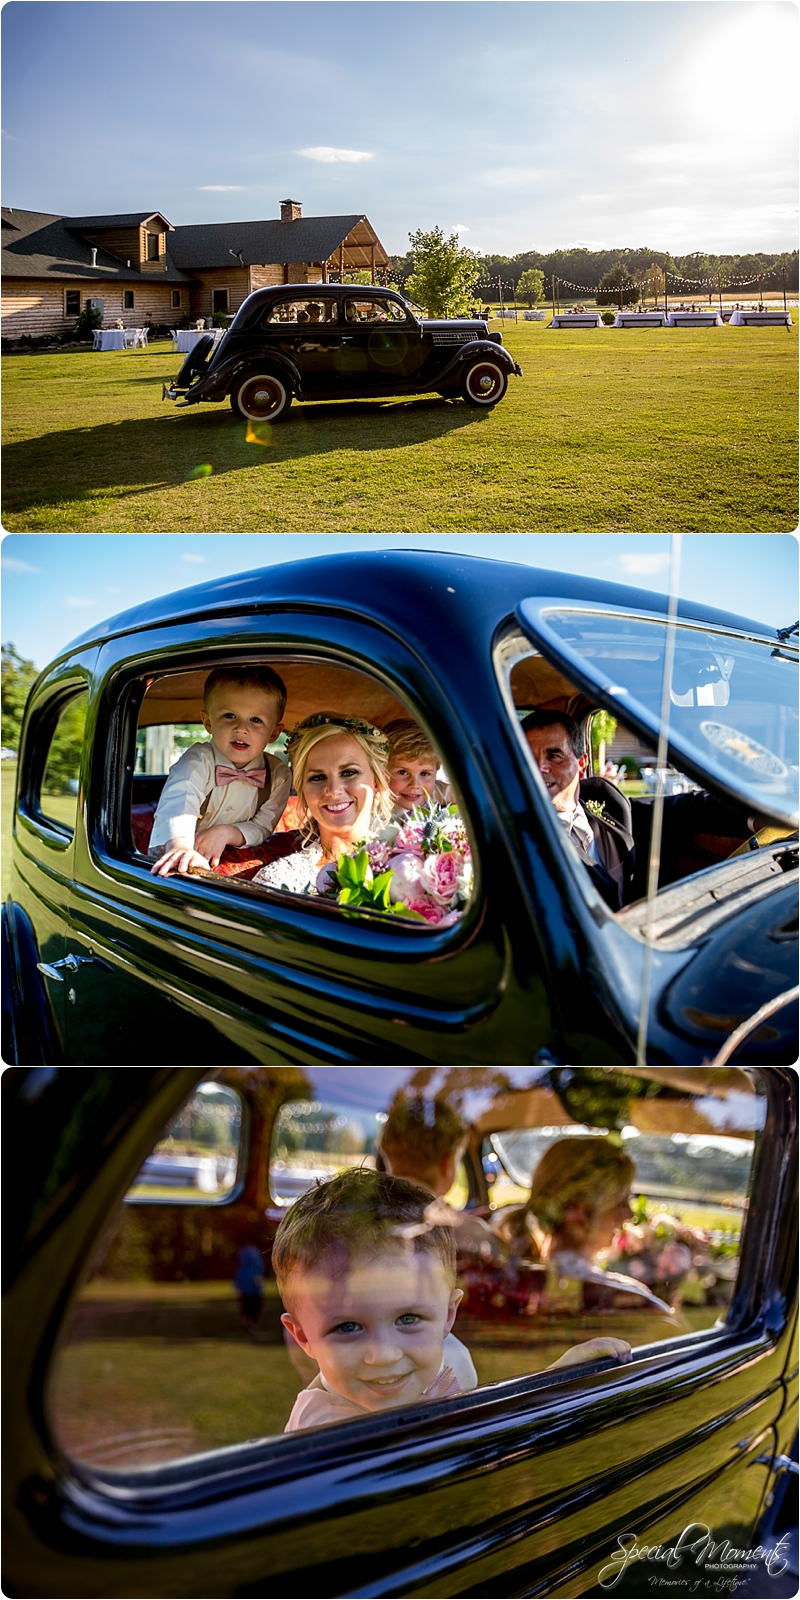 arkansas wedding photographer, southern charm wedding & event house , southern wedding photographer_0953